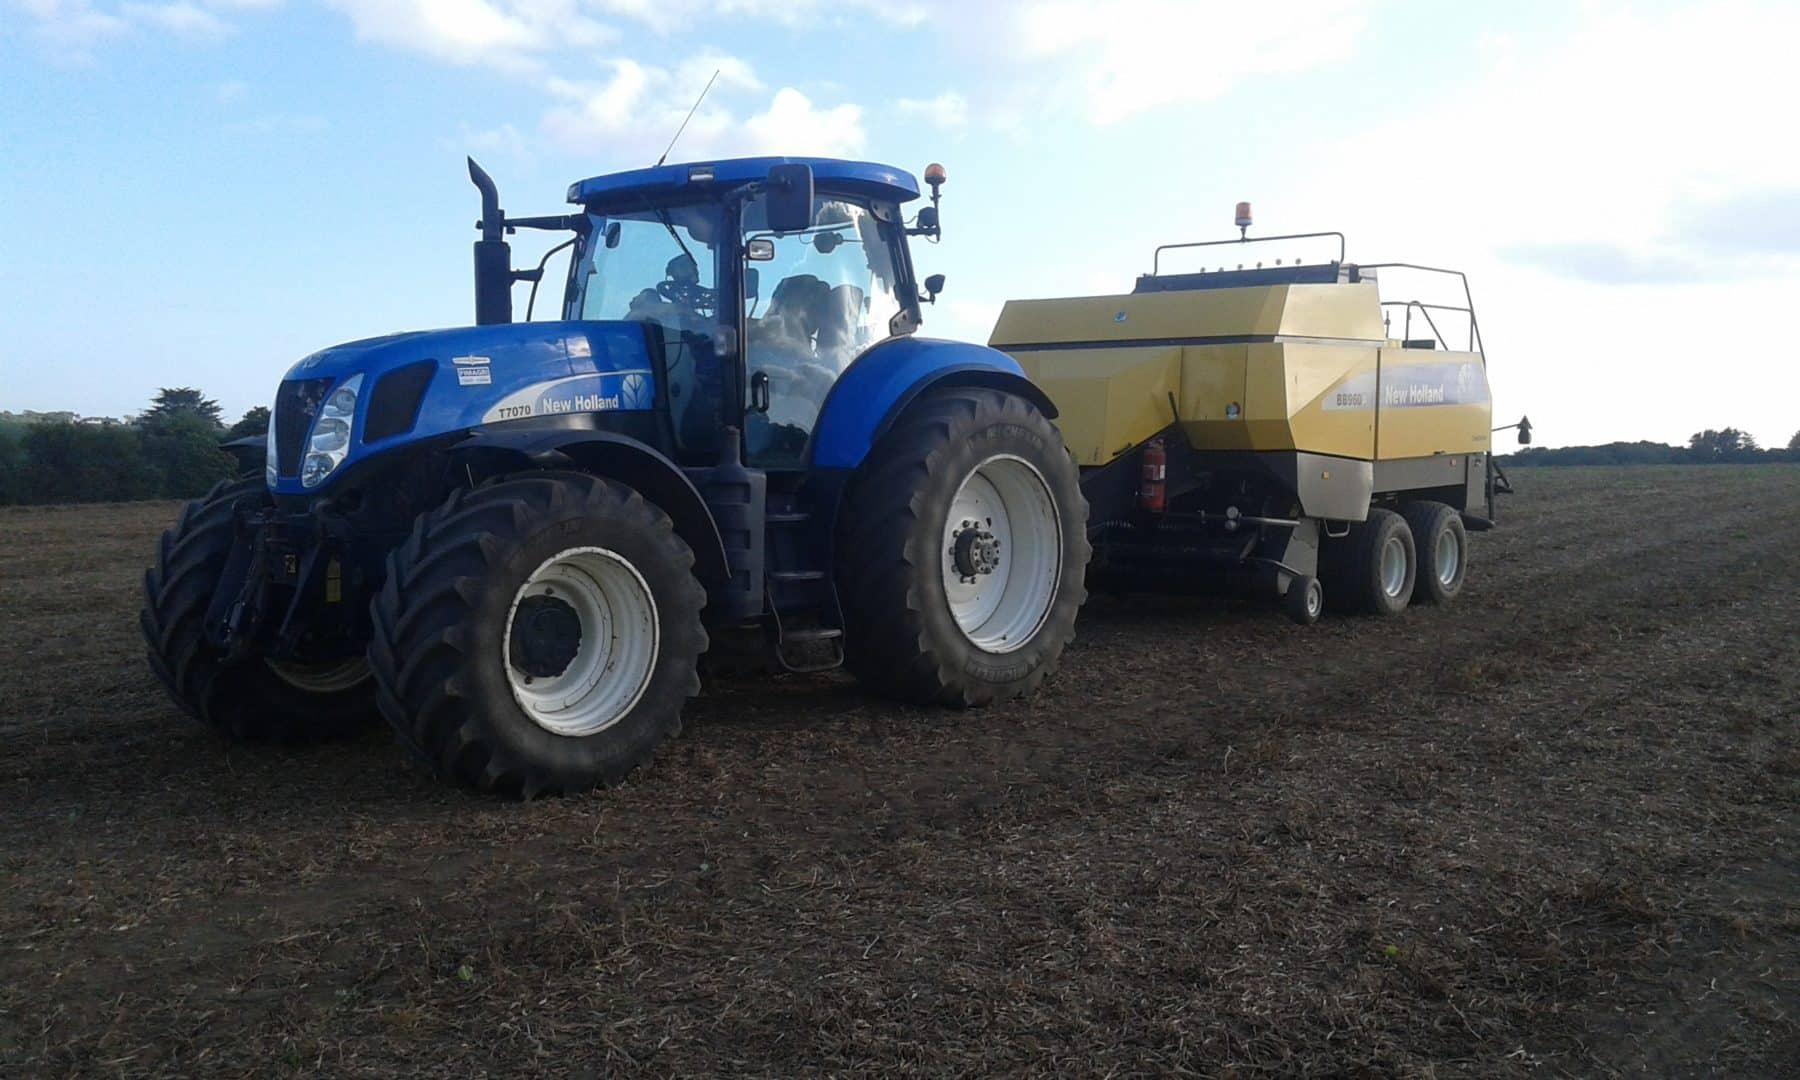 Big Baller - Travaux agricoles